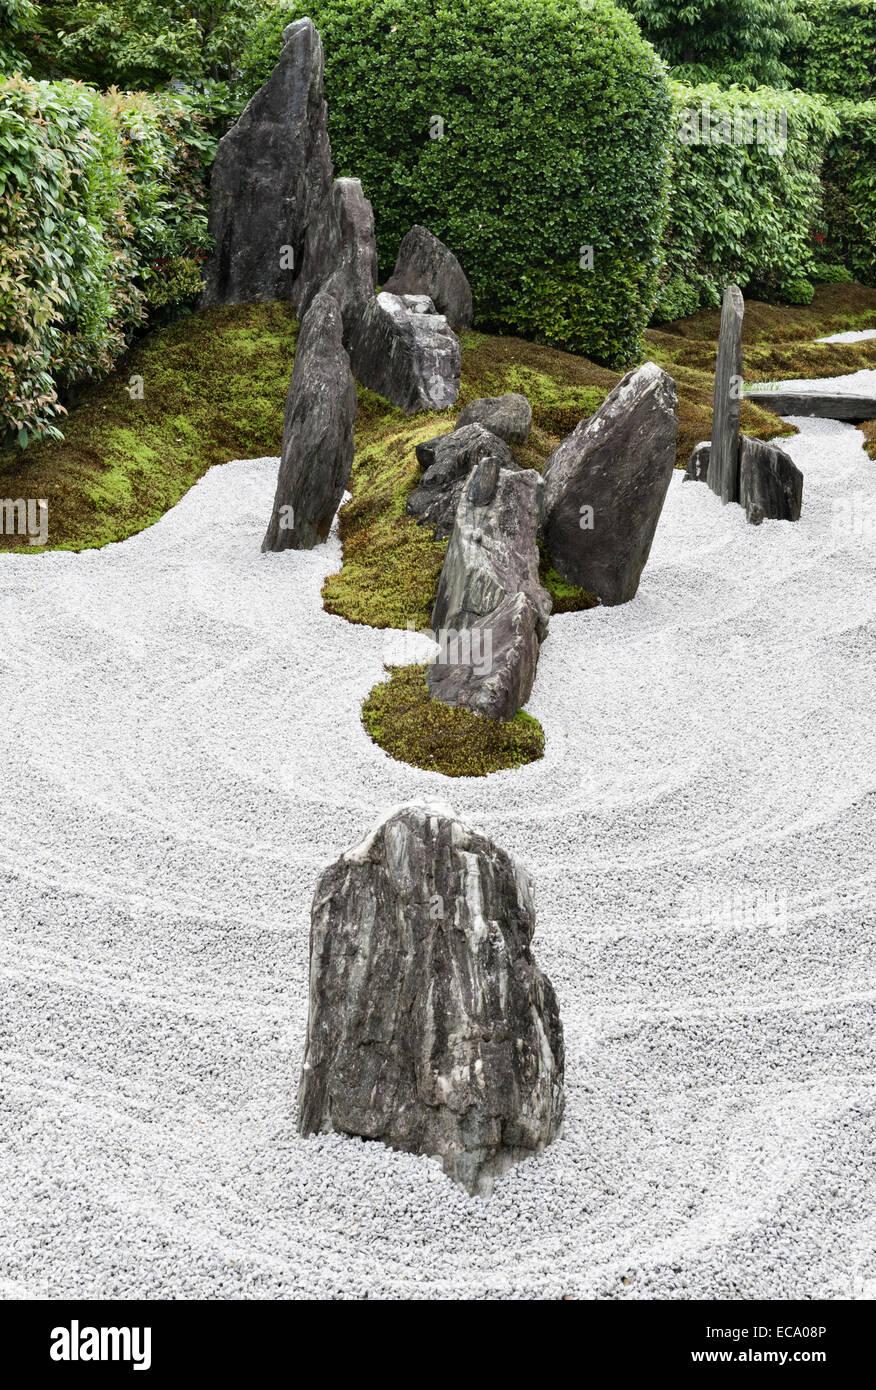 Zuiho-in zen temple, Daitoku-ji, Kyoto, Japan. Rocks and gravel in the South Garden - Stock Image